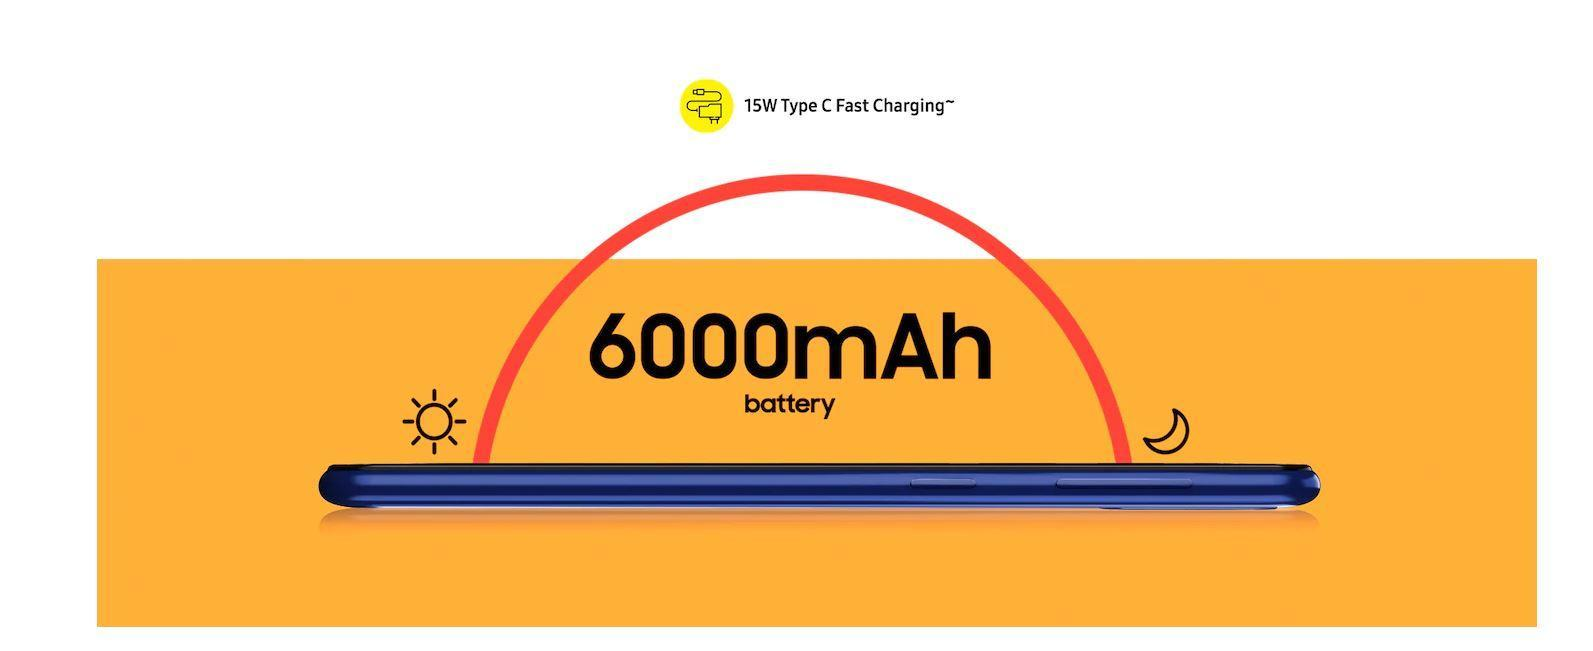 Samsung выпустил недорогие Galaxy M21 и M11 (m11 m21 battery)